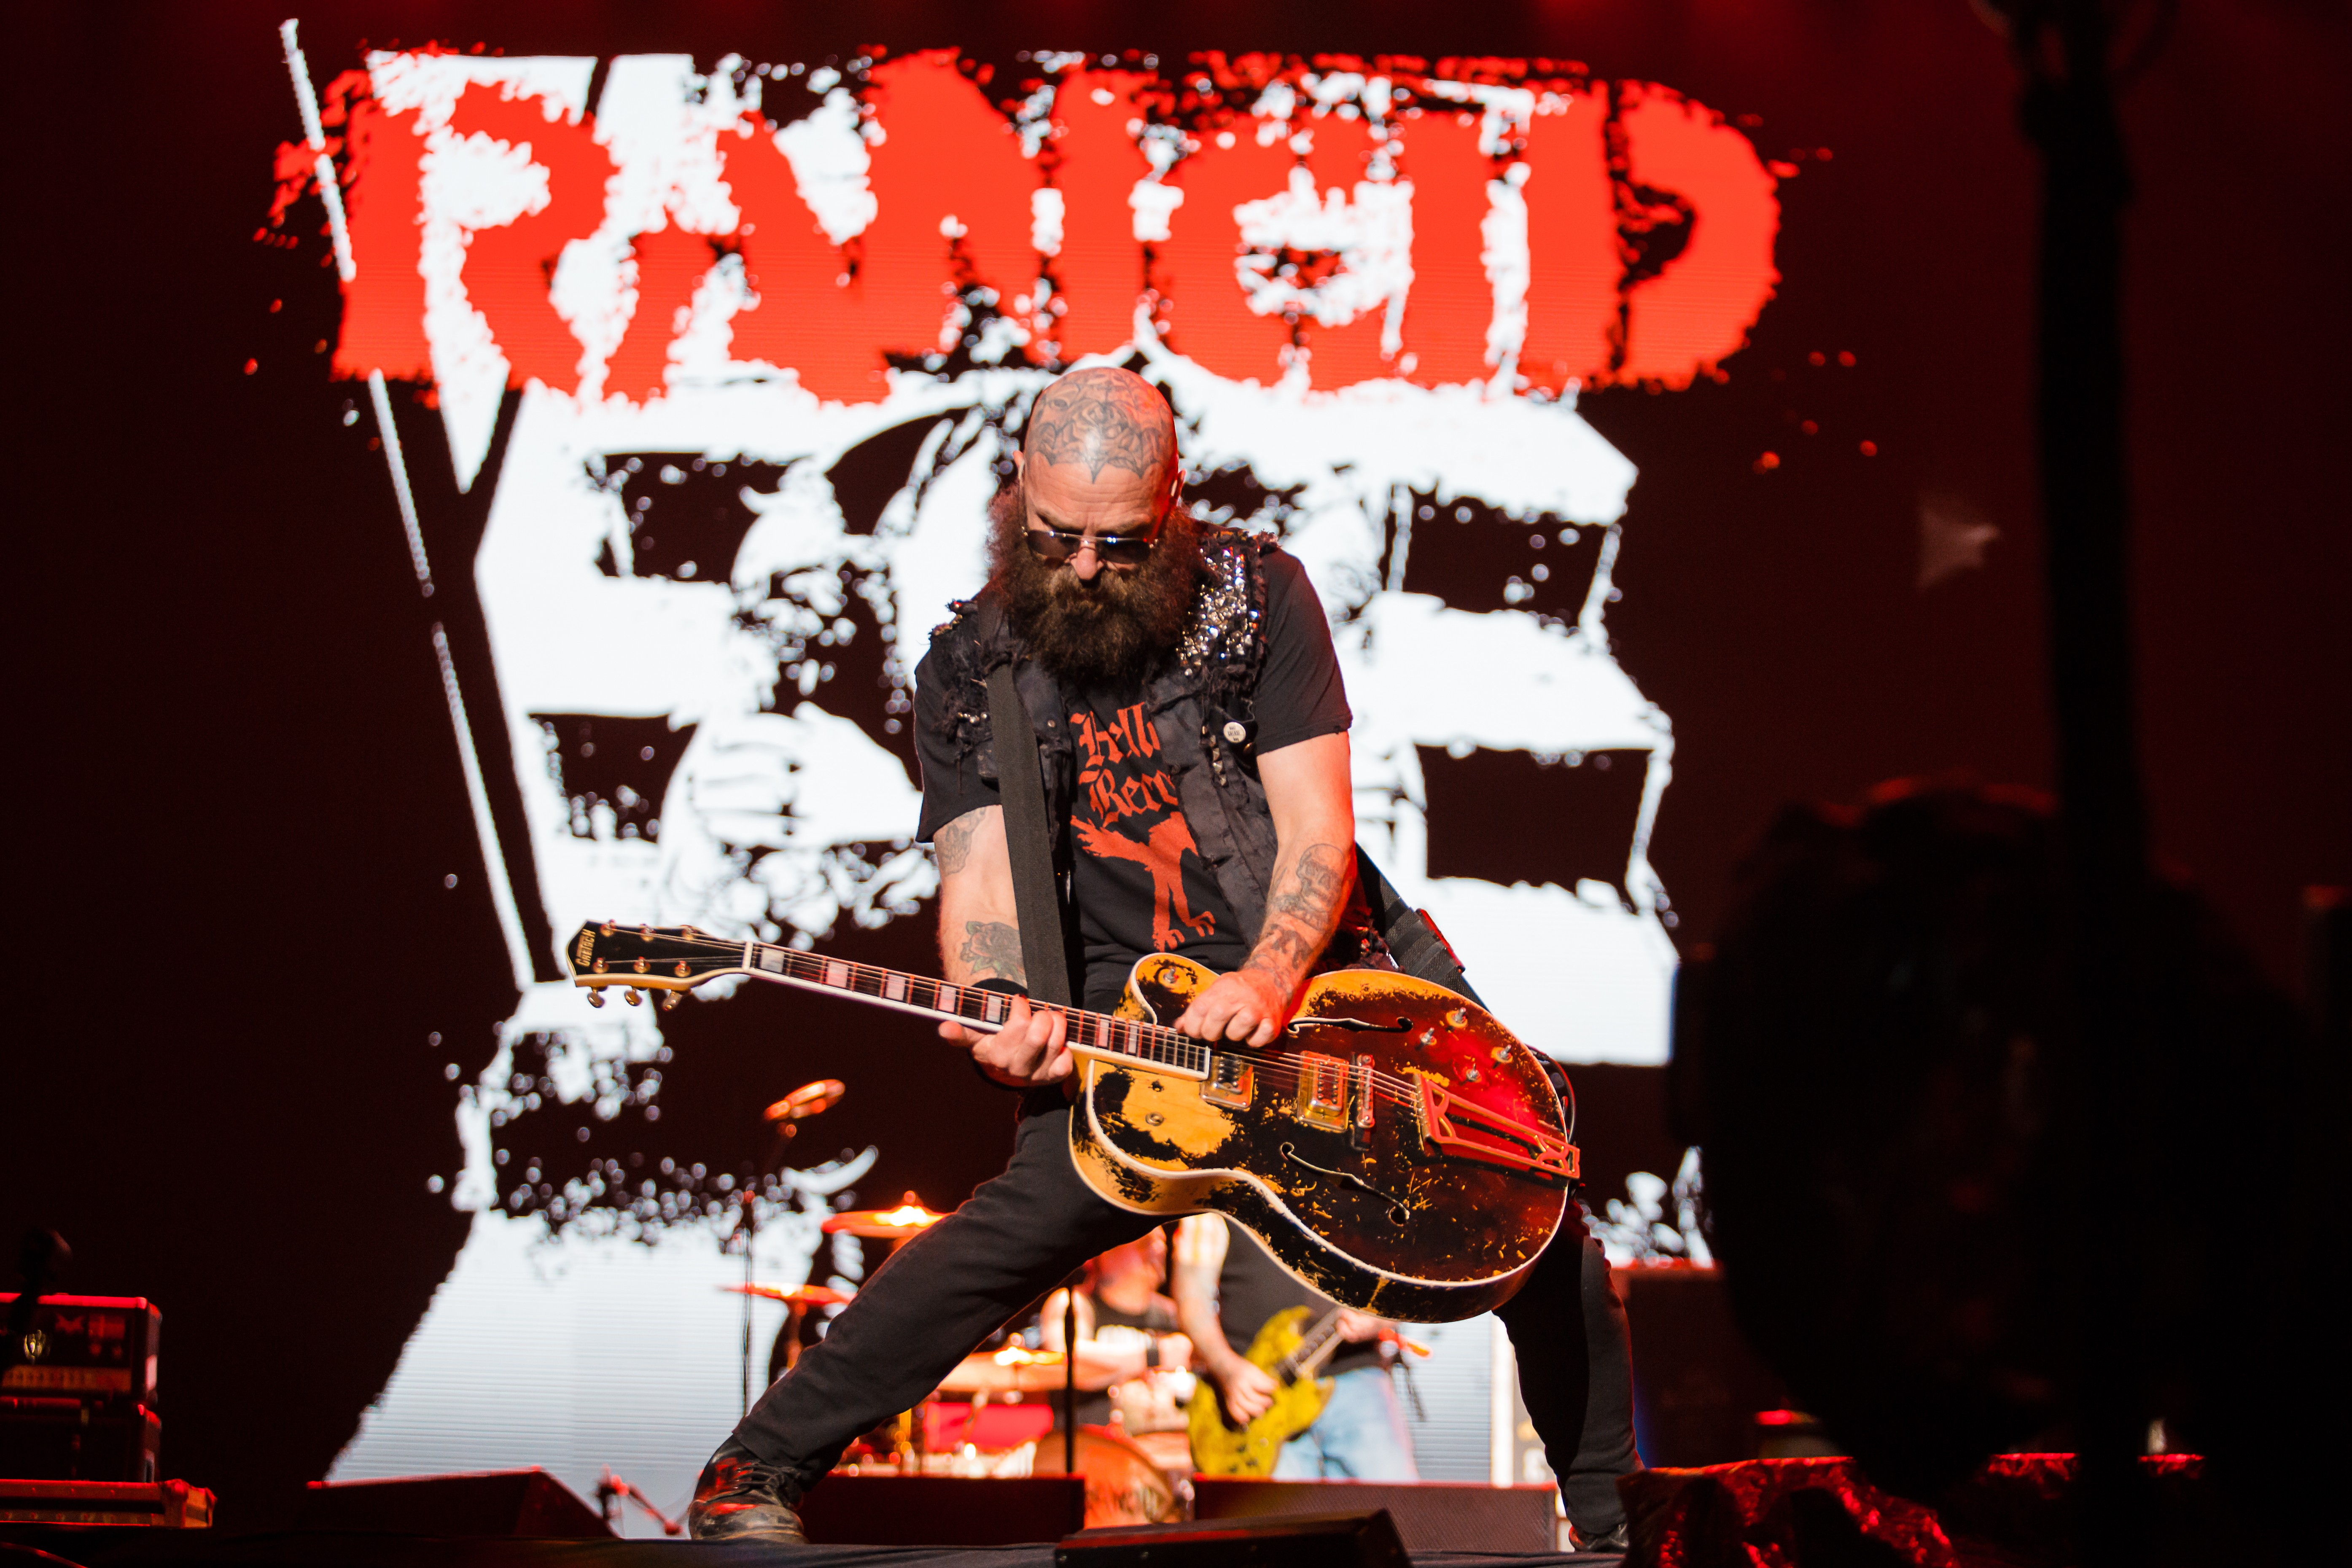 rancid tour september 2019